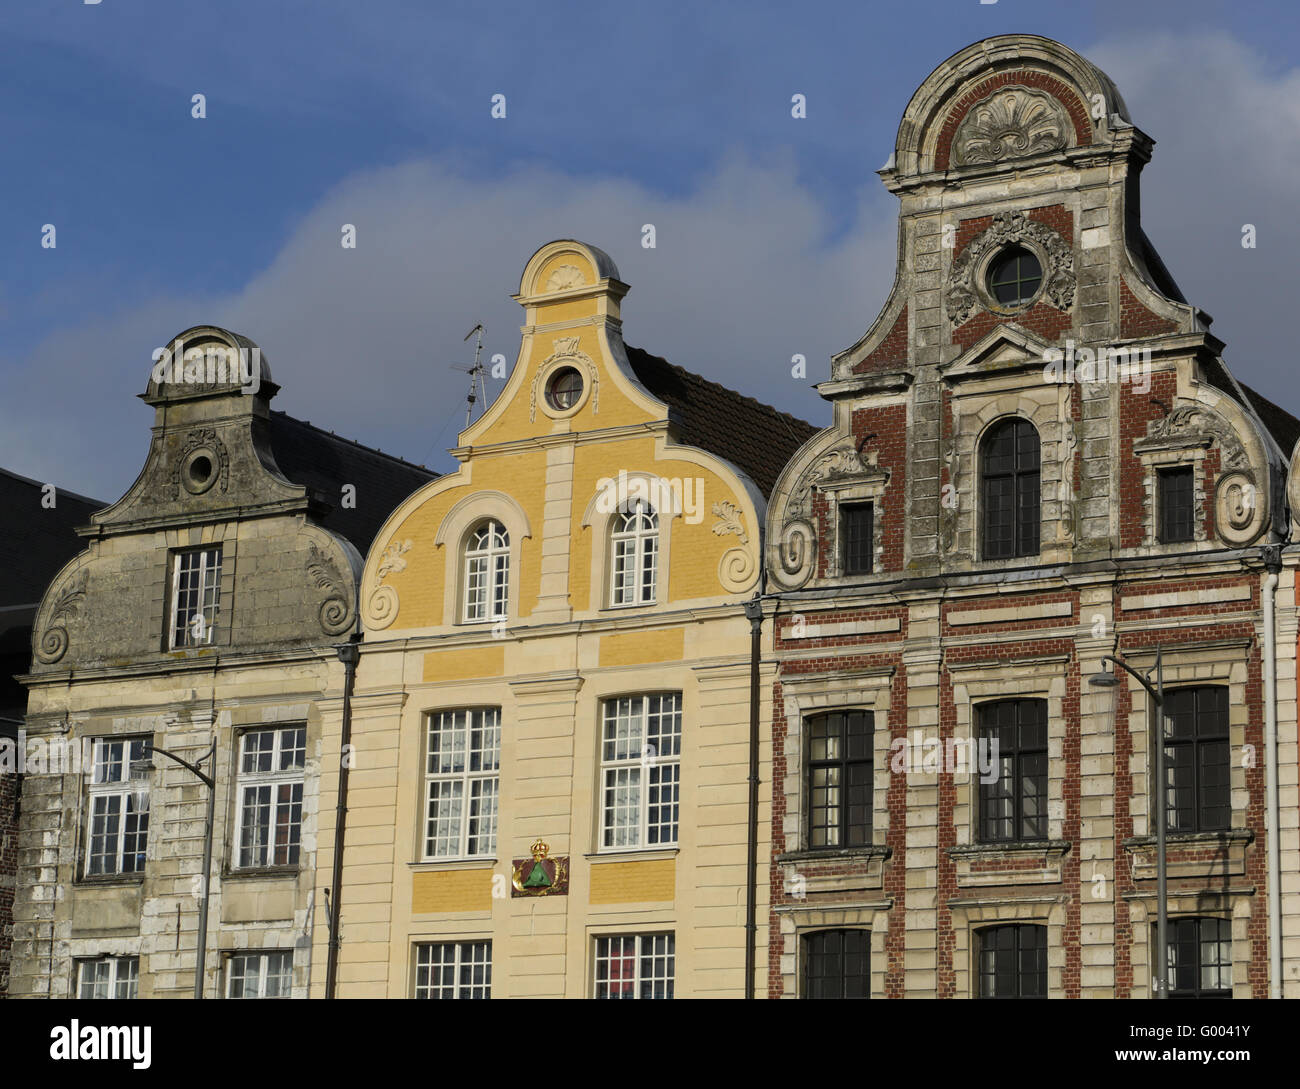 Arras - Stock Image